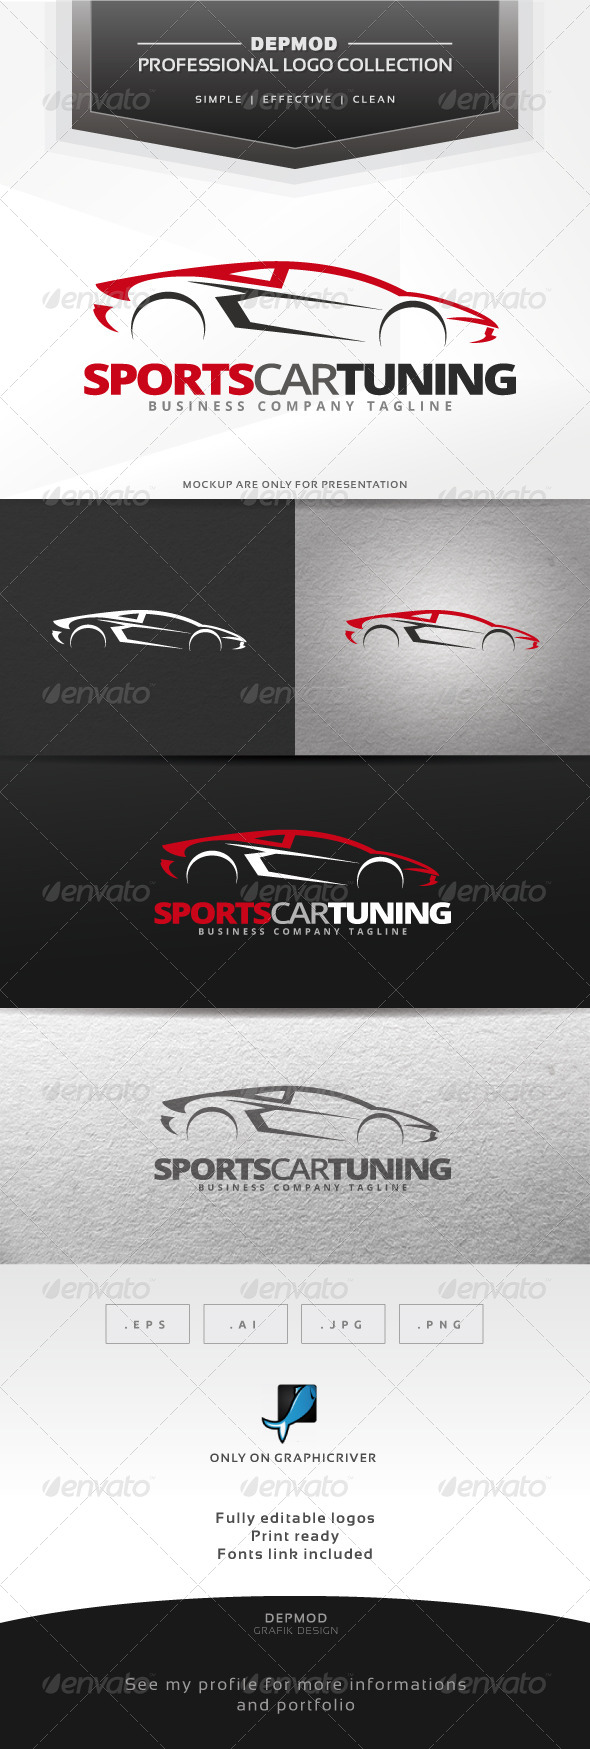 Sports Car Tuning Logo